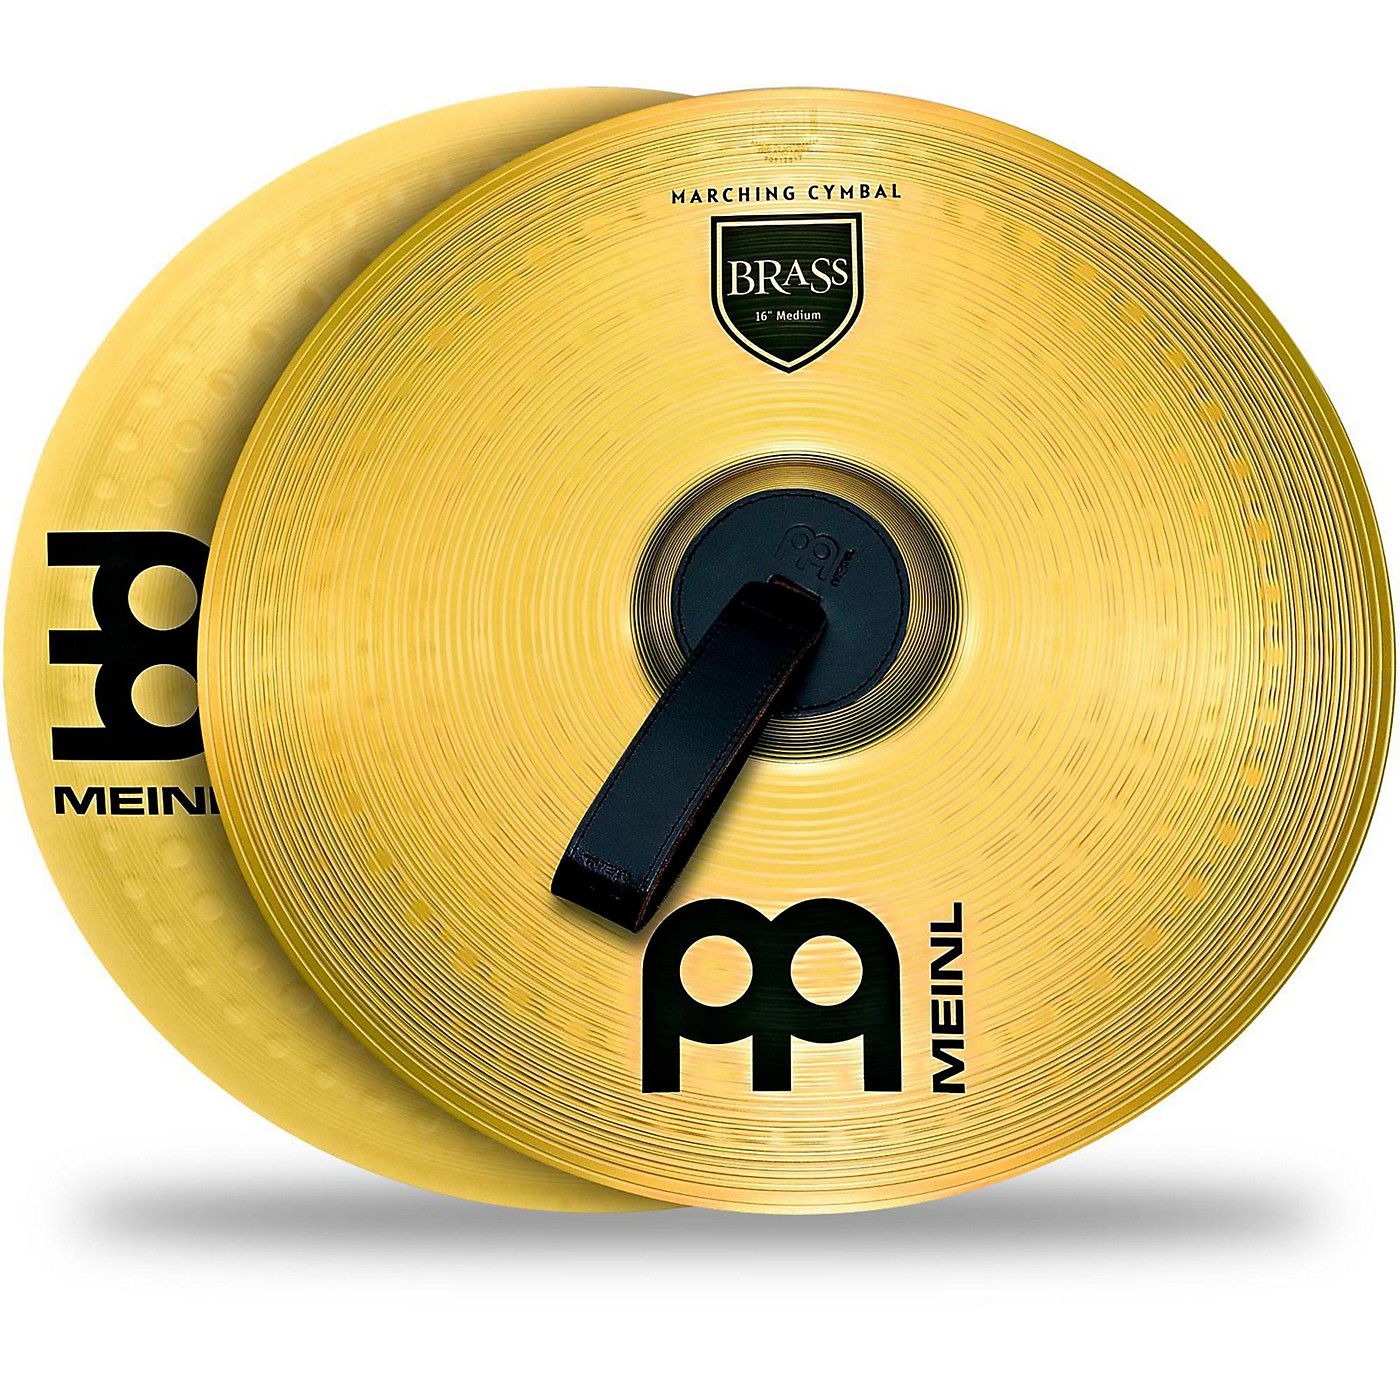 Meinl Brass Marching Cymbal Pair thumbnail